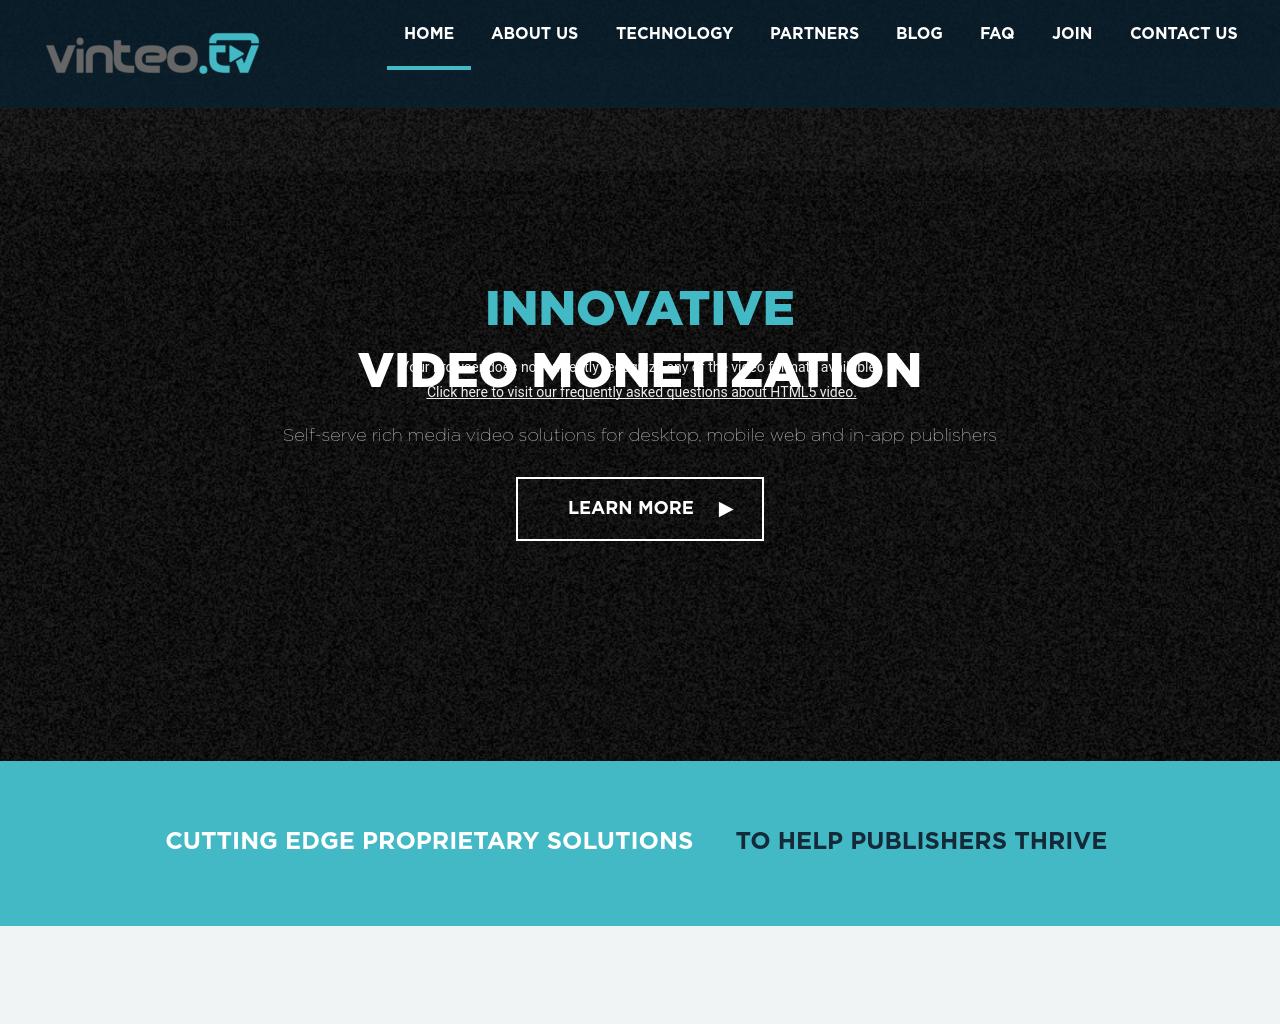 Vinteo.tv-Advertising-Reviews-Pricing